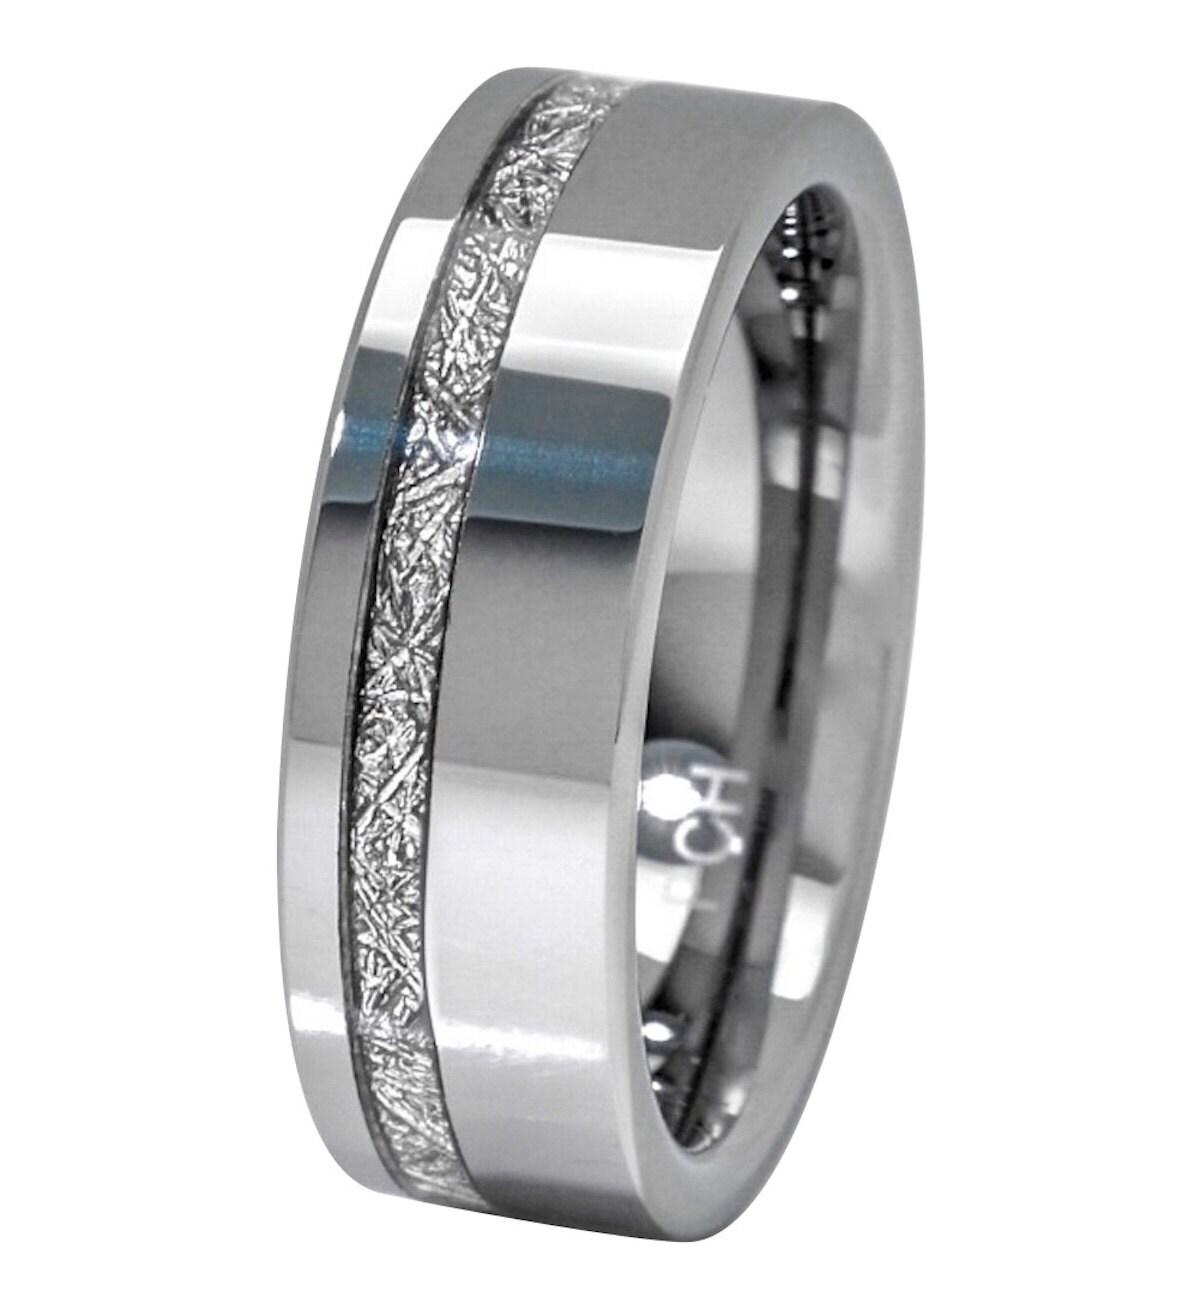 Meteorite Ring 8mm Comfort Fit Mens Tungsten Wedding Band Thin